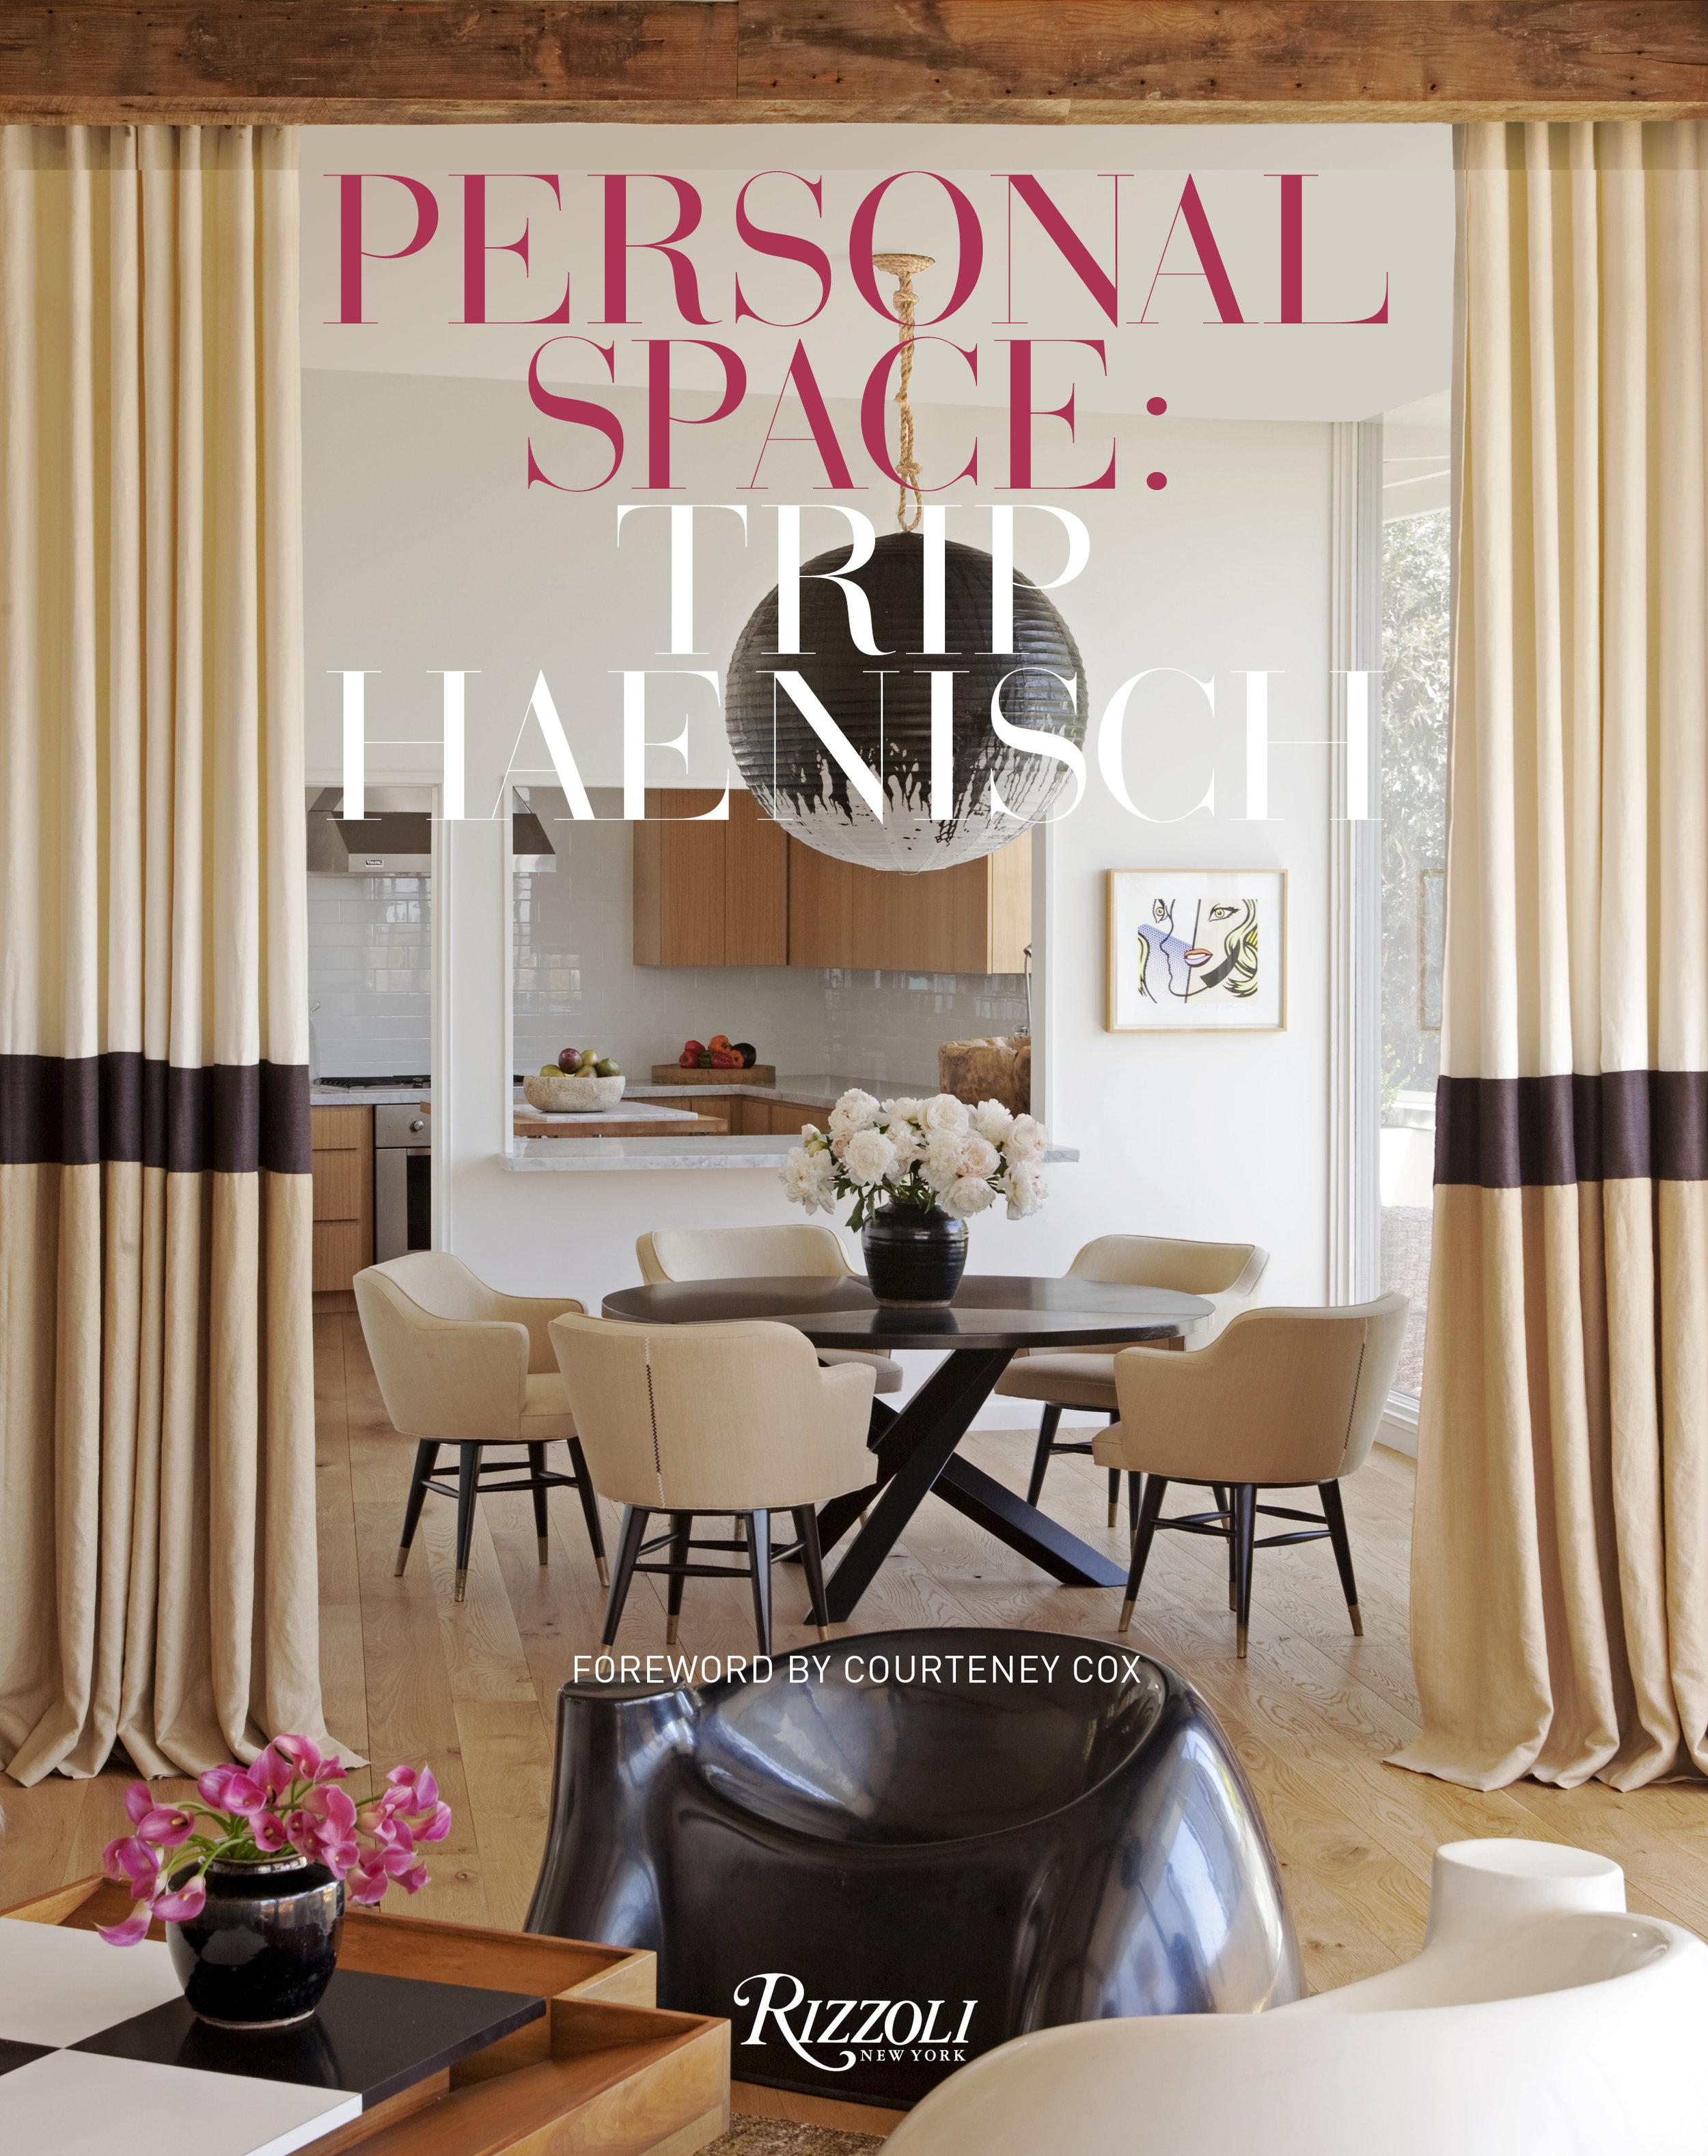 PersonalSpace_TripHaenisch_cover.jpg